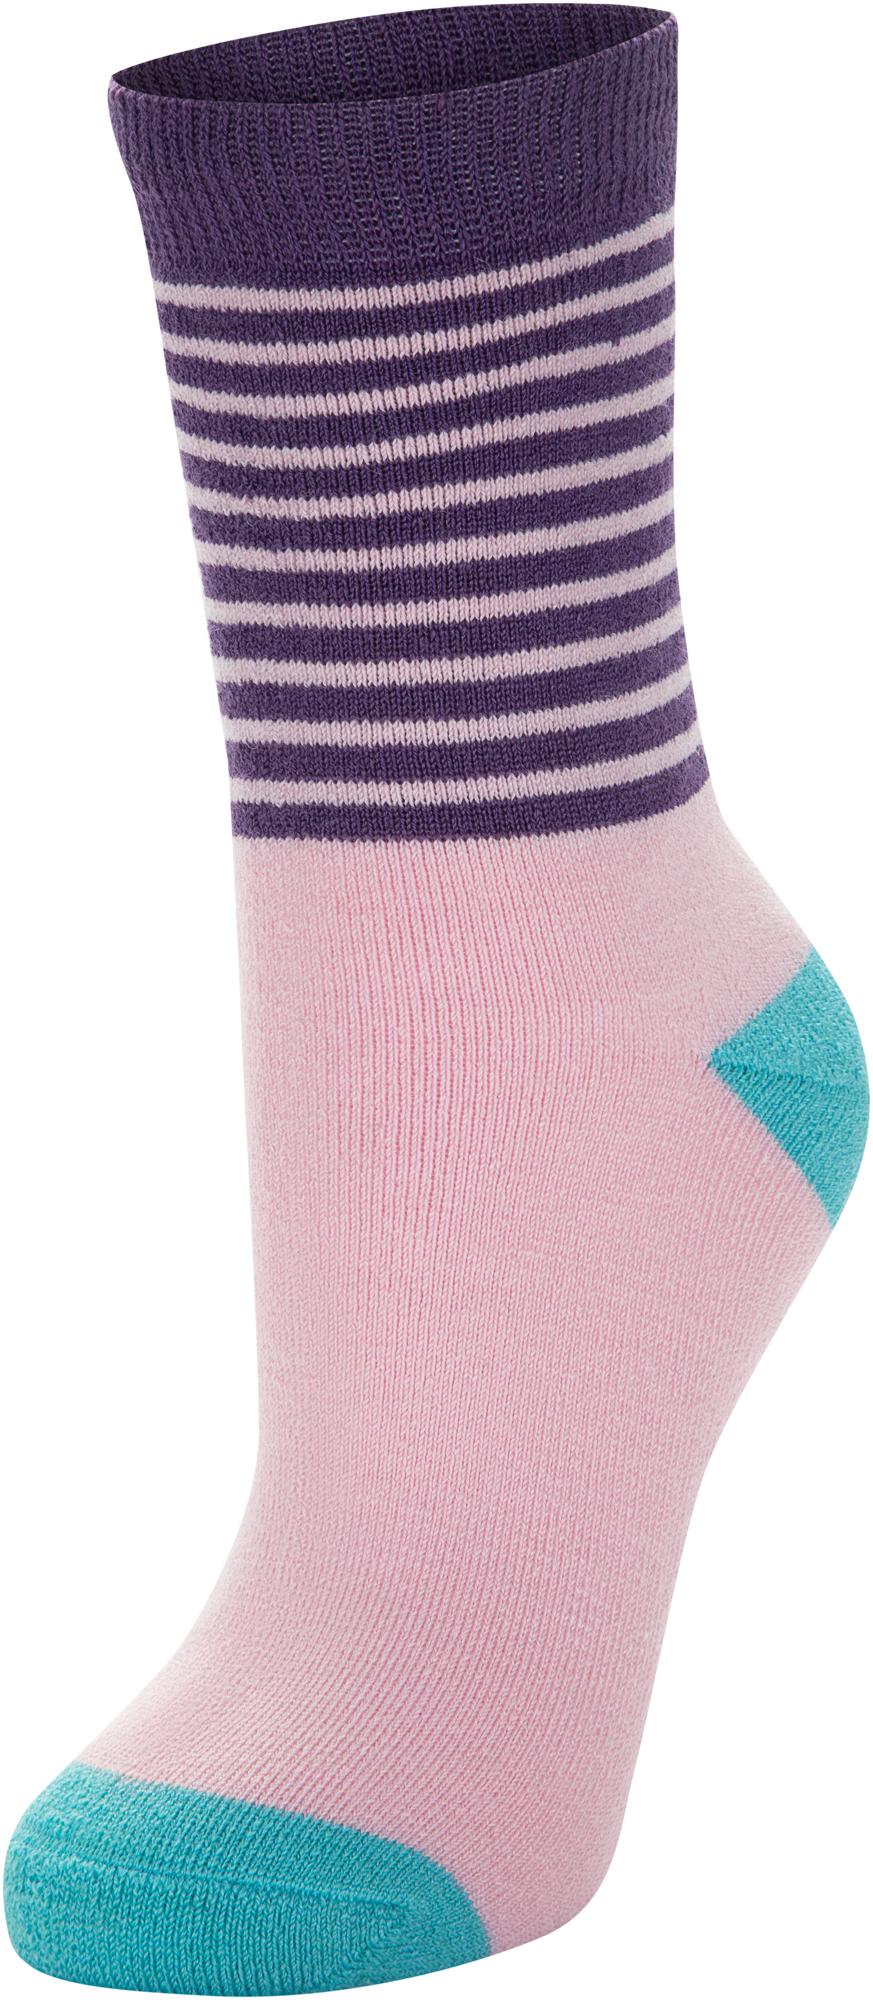 Demix Носки для девочек Demix, 1 пара, размер 34-36